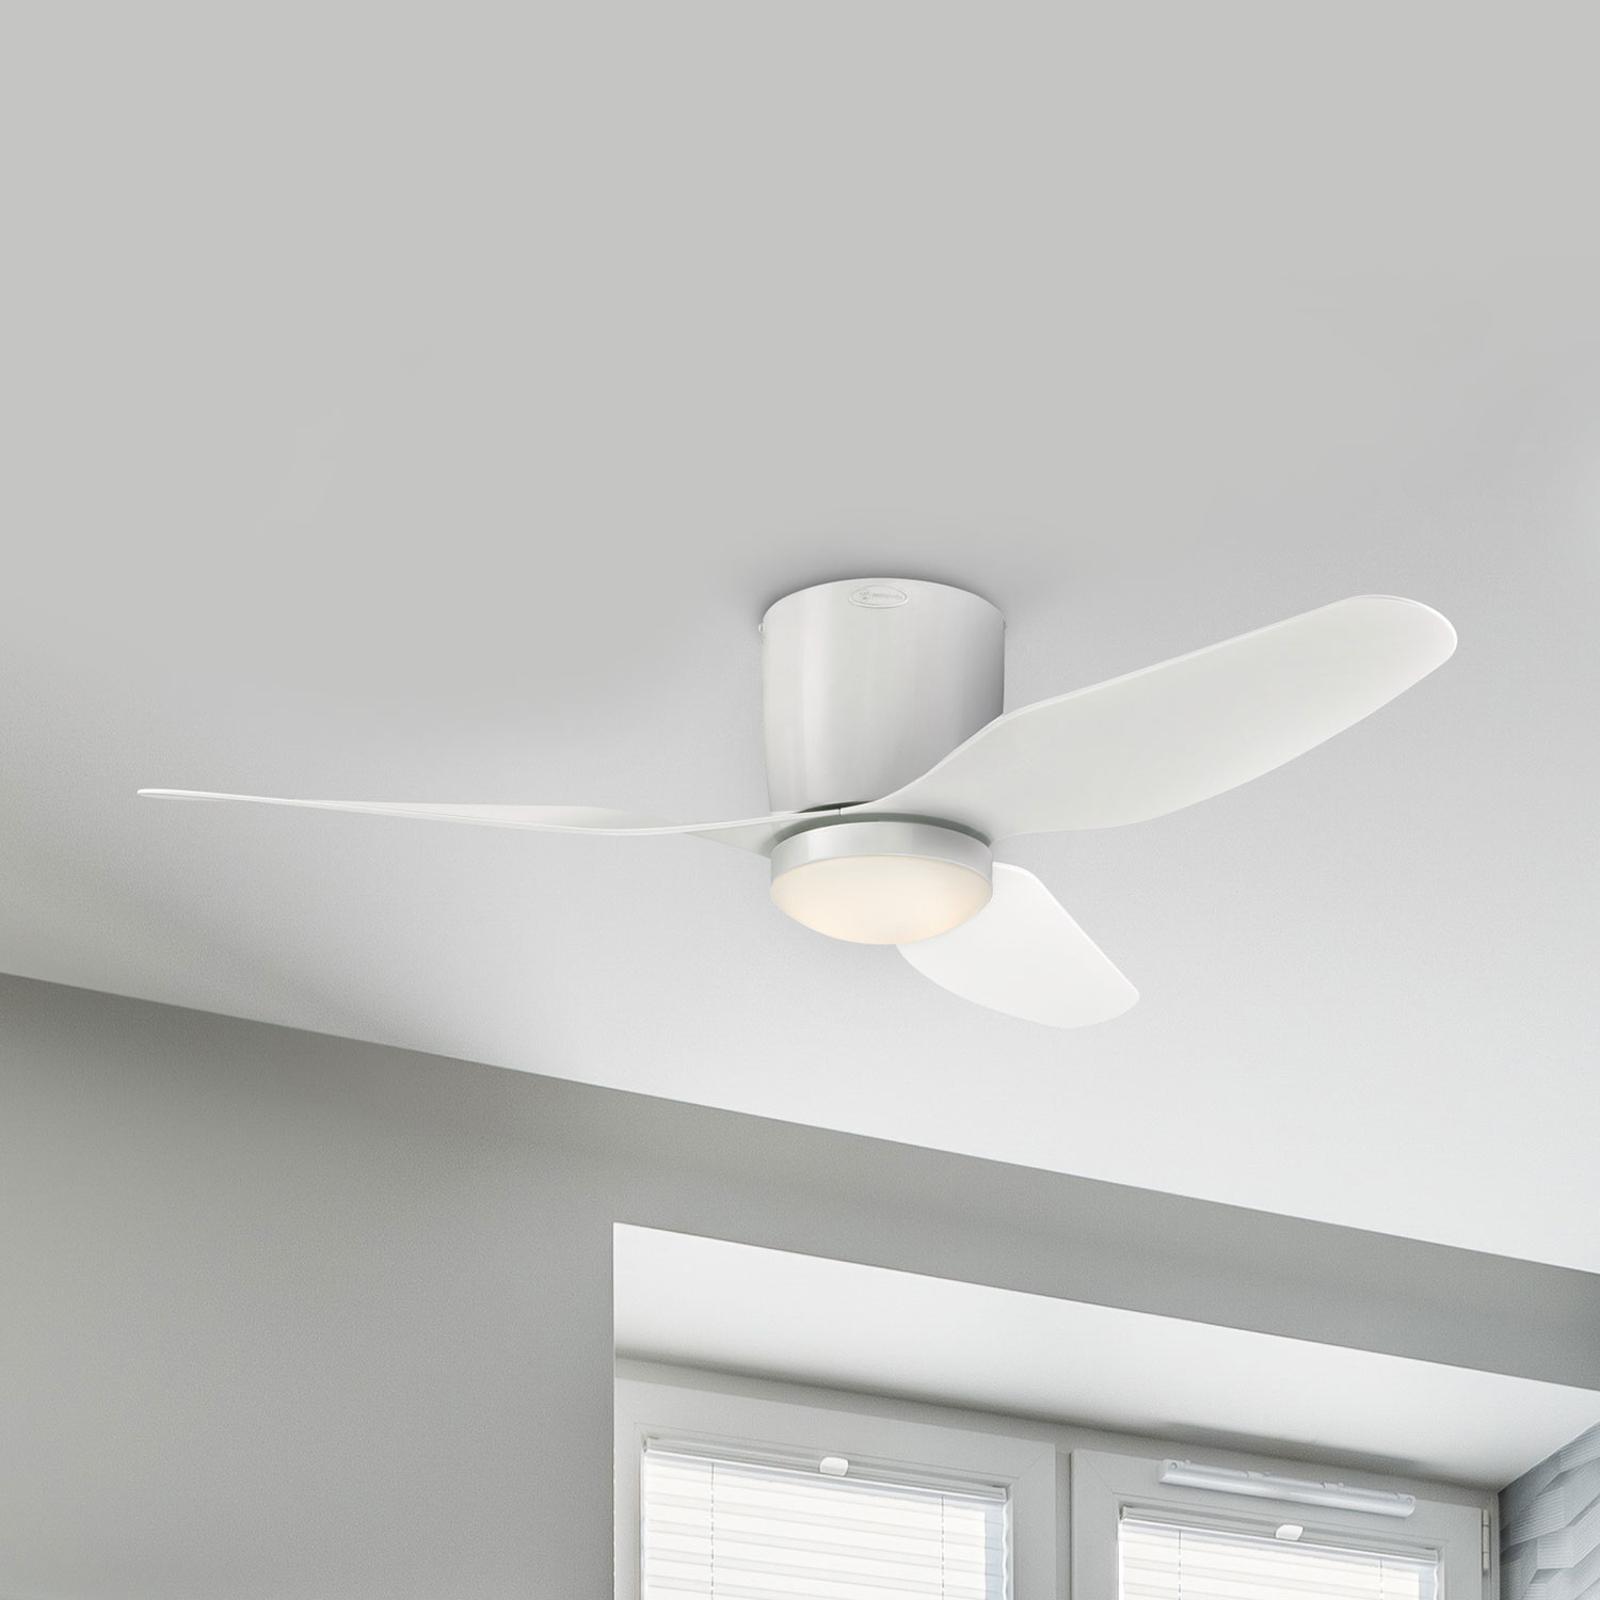 Westinghouse Carla loftventilator med LED, hvid